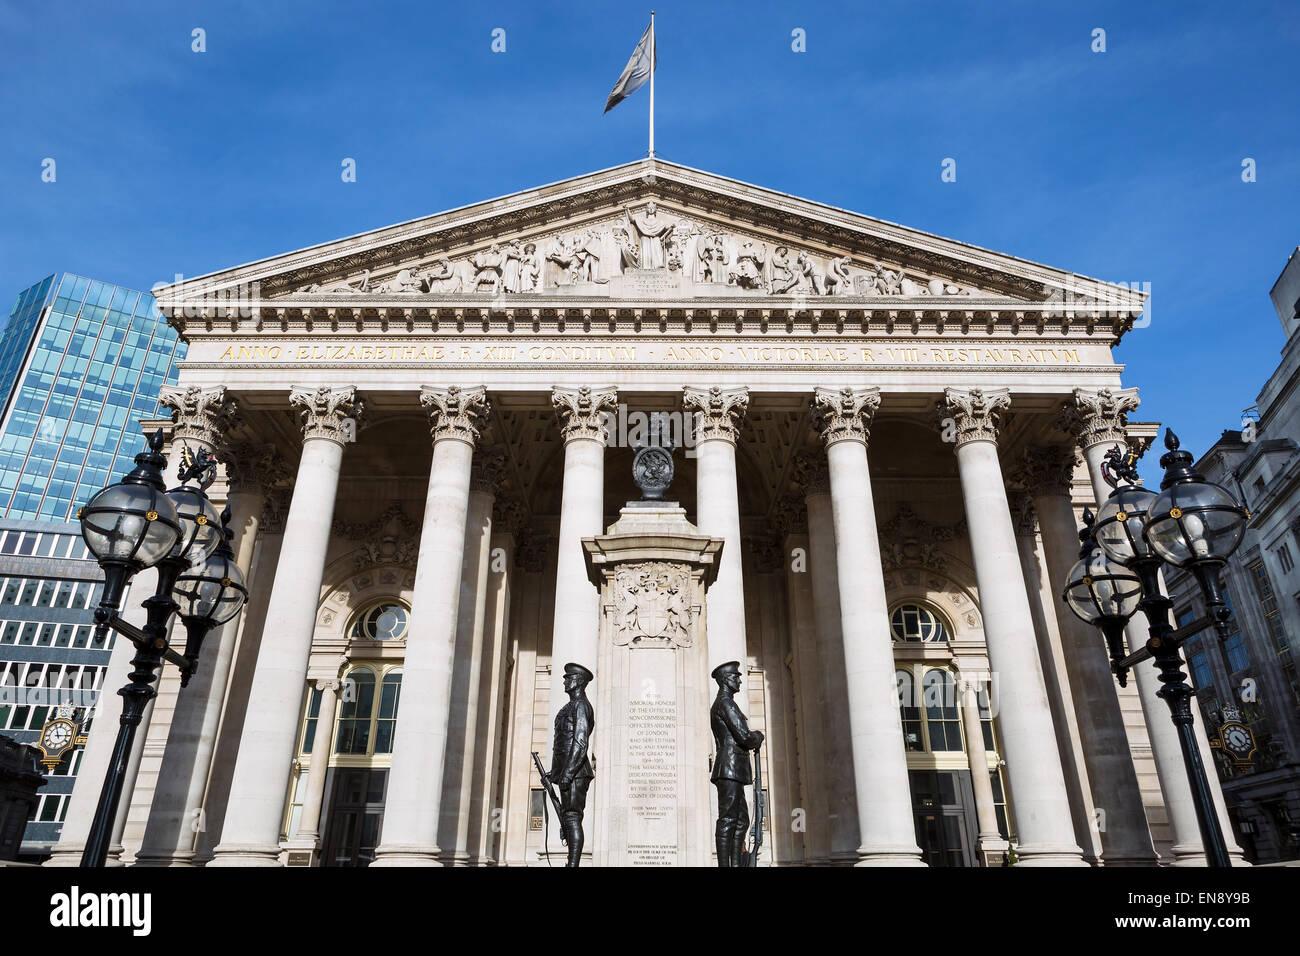 Royal Exchange, London, England, UK, Europe, now a luxury shopping centre. - Stock Image